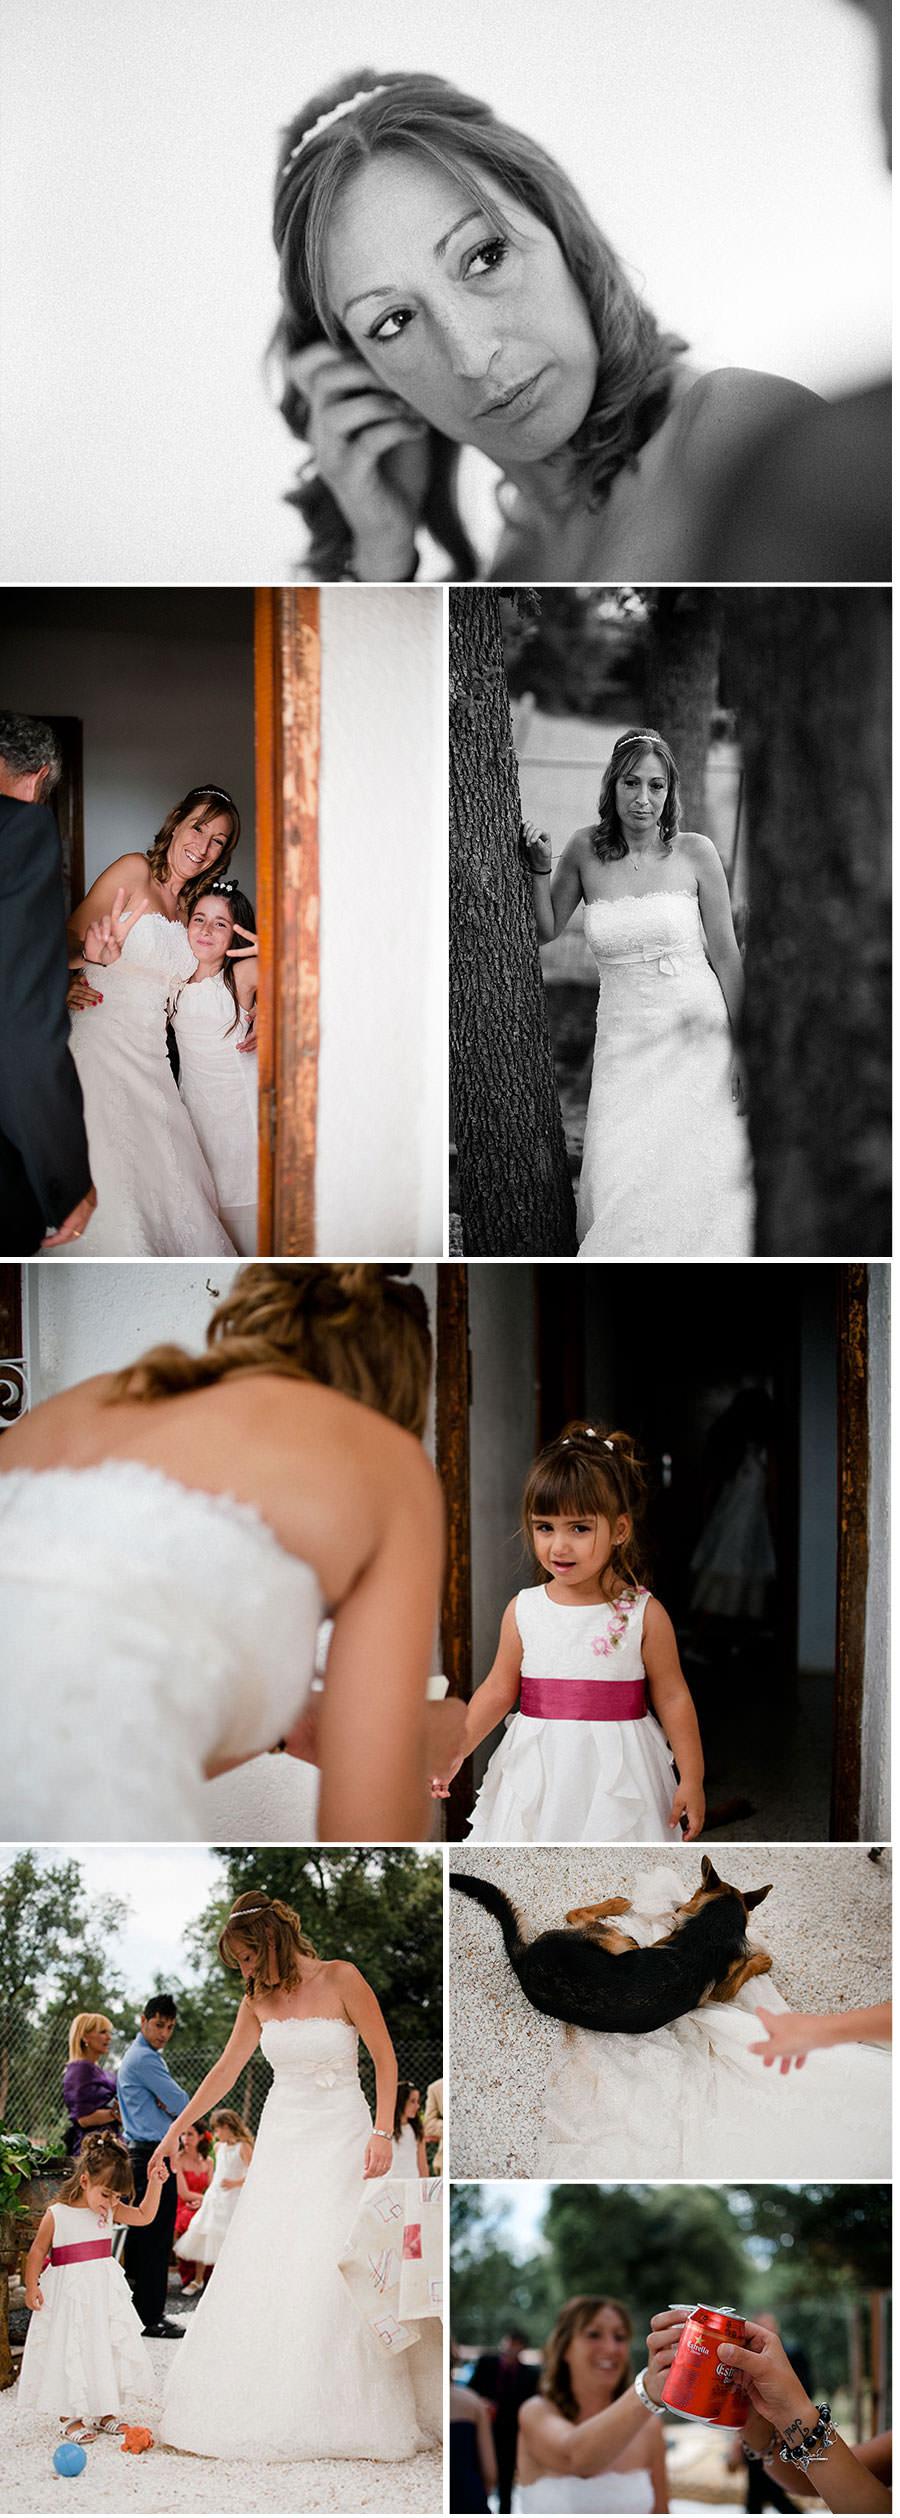 Esteban & Laura's wedding at Mas Sola, Santa Coloma de Farners, Spain. 149